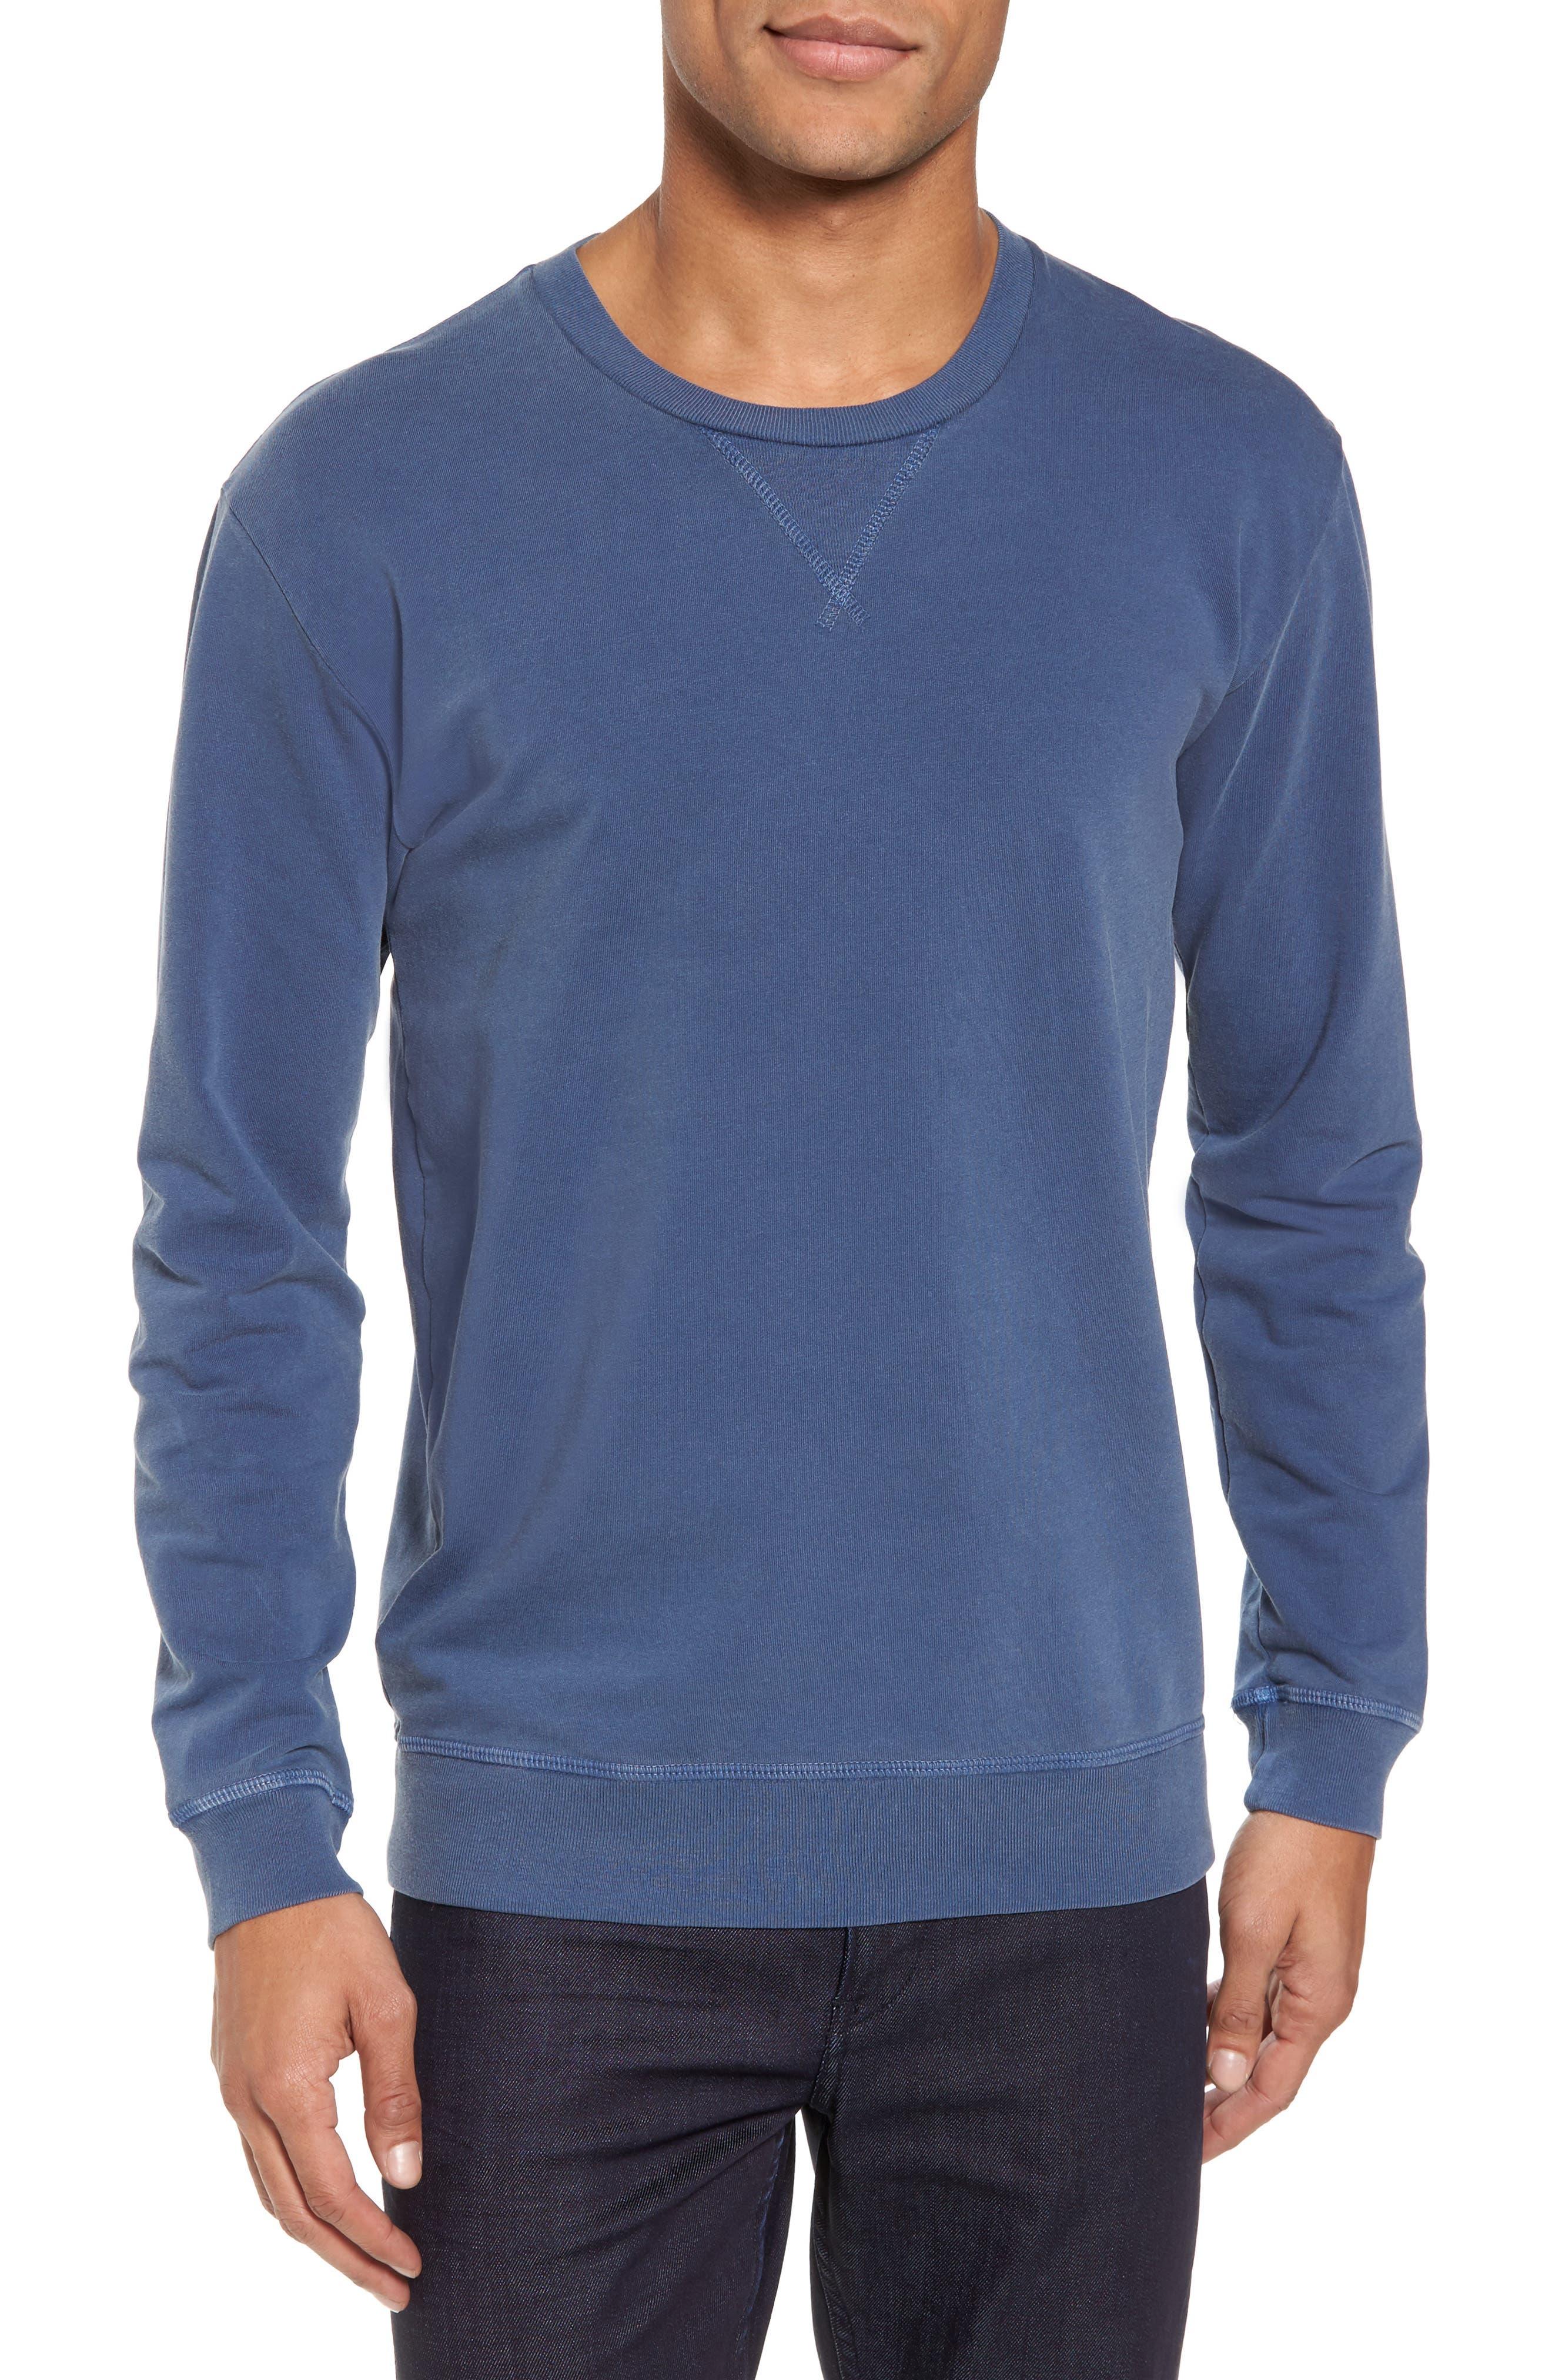 GOODLIFE Slim Fit Crewneck Sweatshirt, Main, color, FADED NAVY